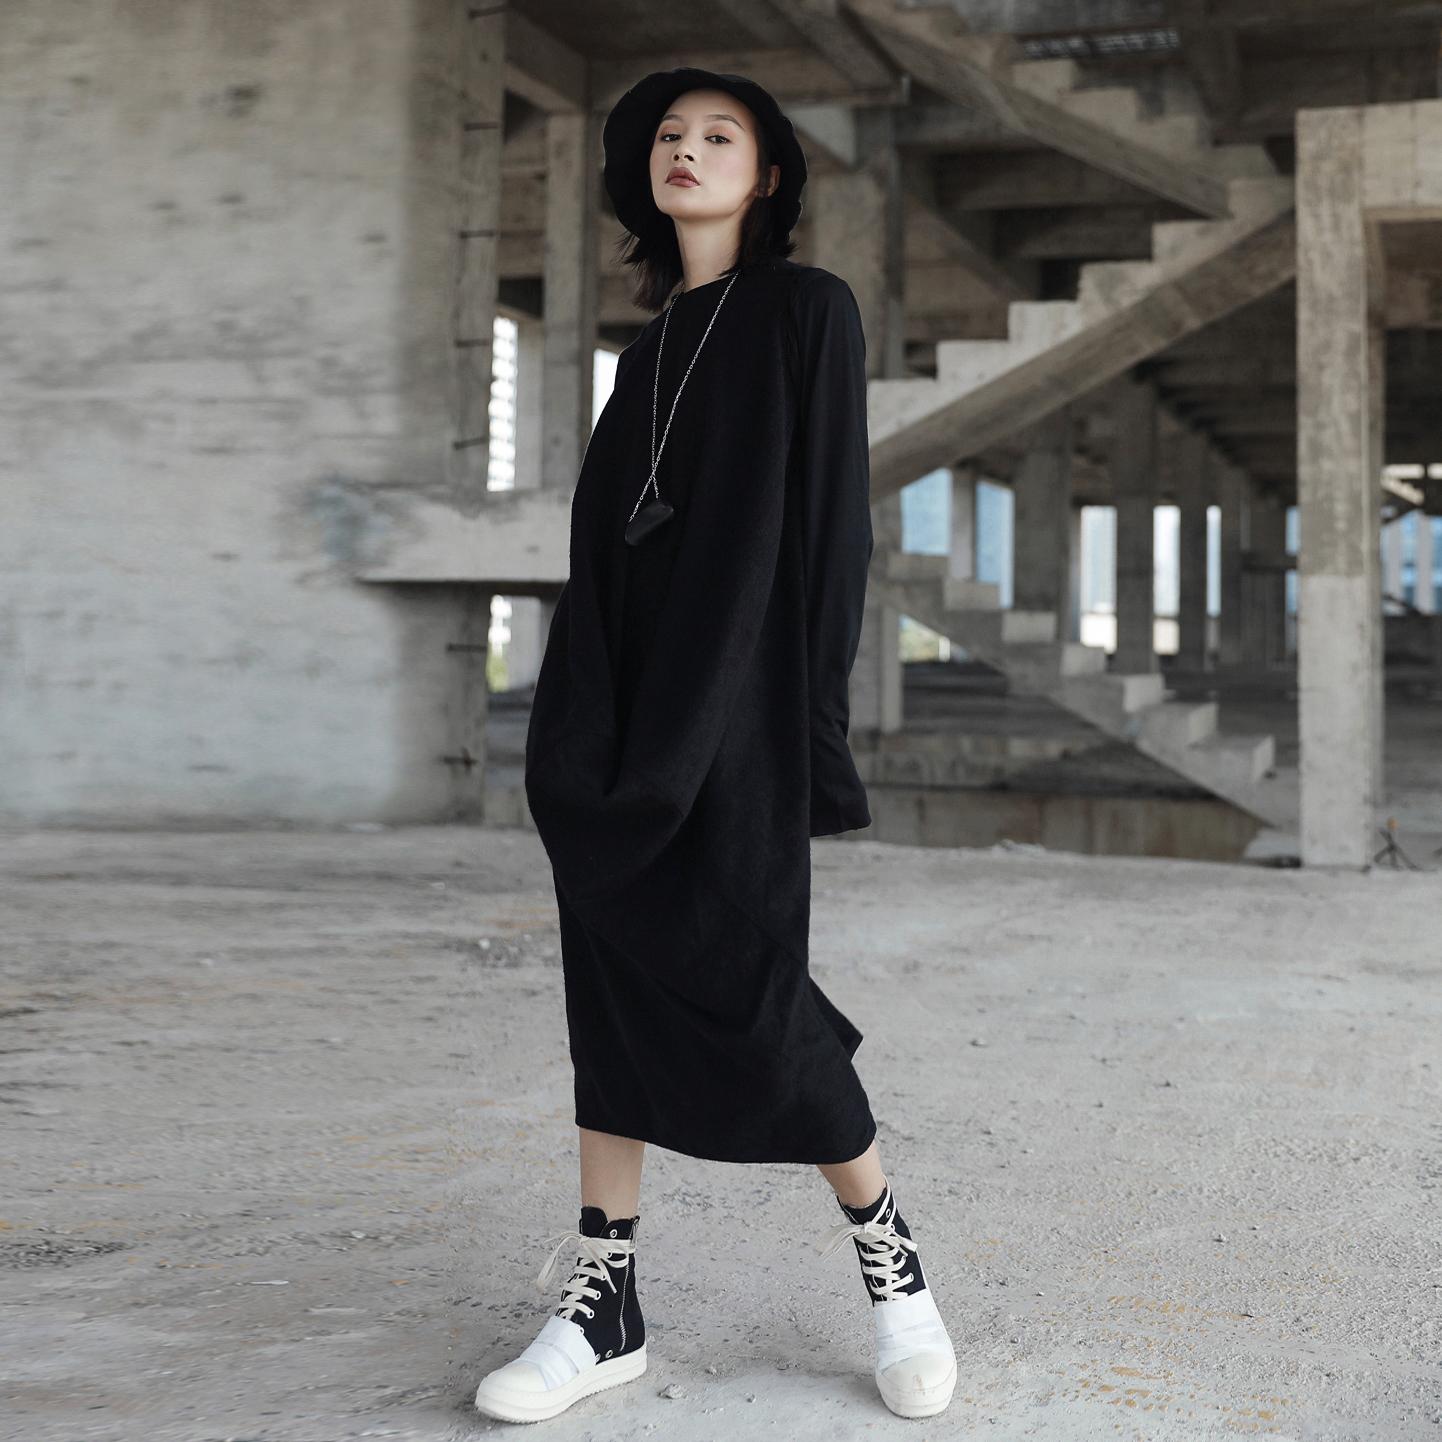 SIMPLE BLACK 秋冬暗黑RO风格无袖针织羊毛不规则中长款连衣裙女